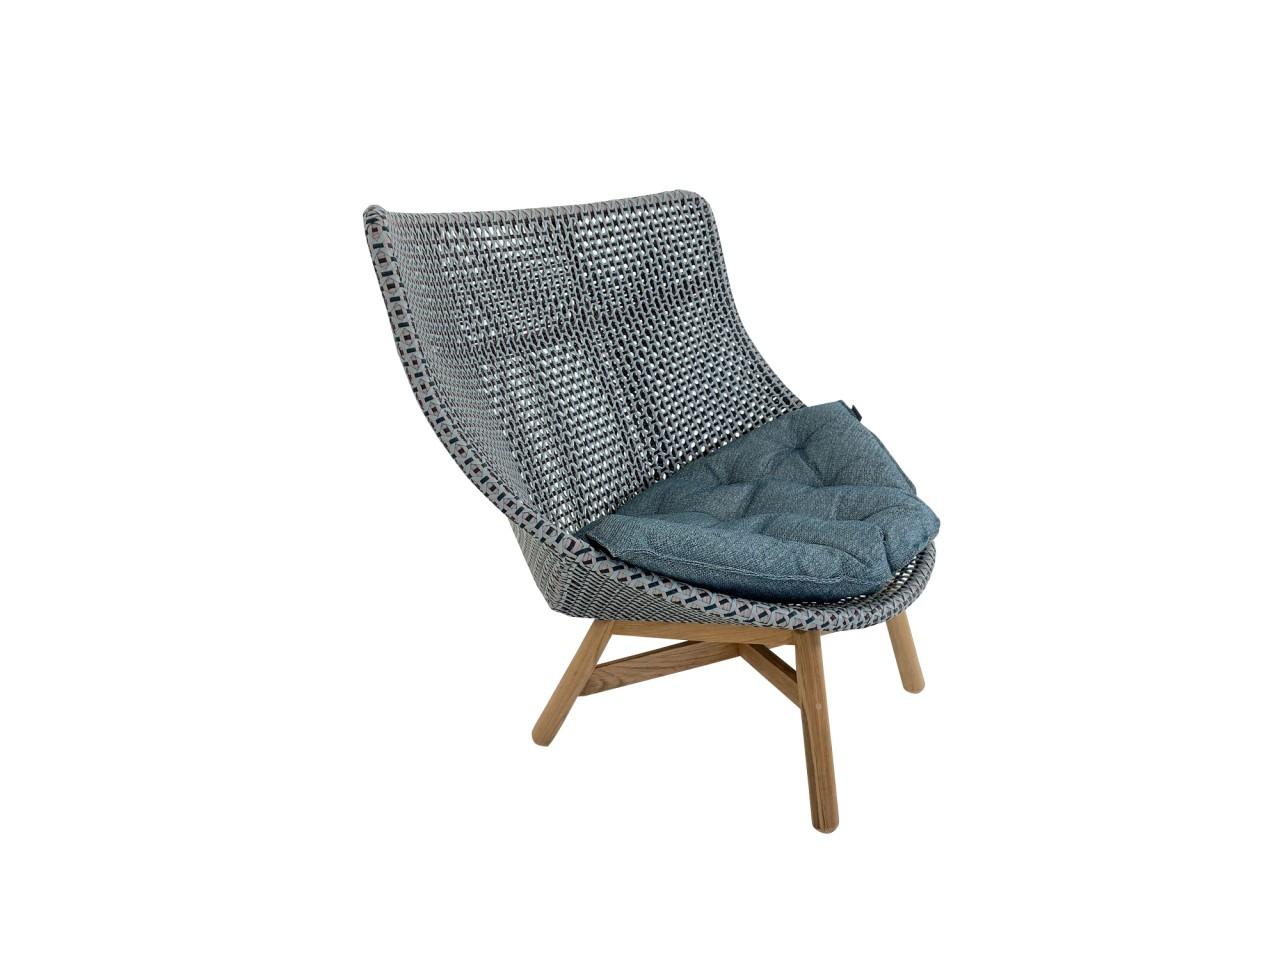 Dedon MBRACE WING CHAIR Hochlehner Sessel in baltic mit Sitzkissen in topaz blue